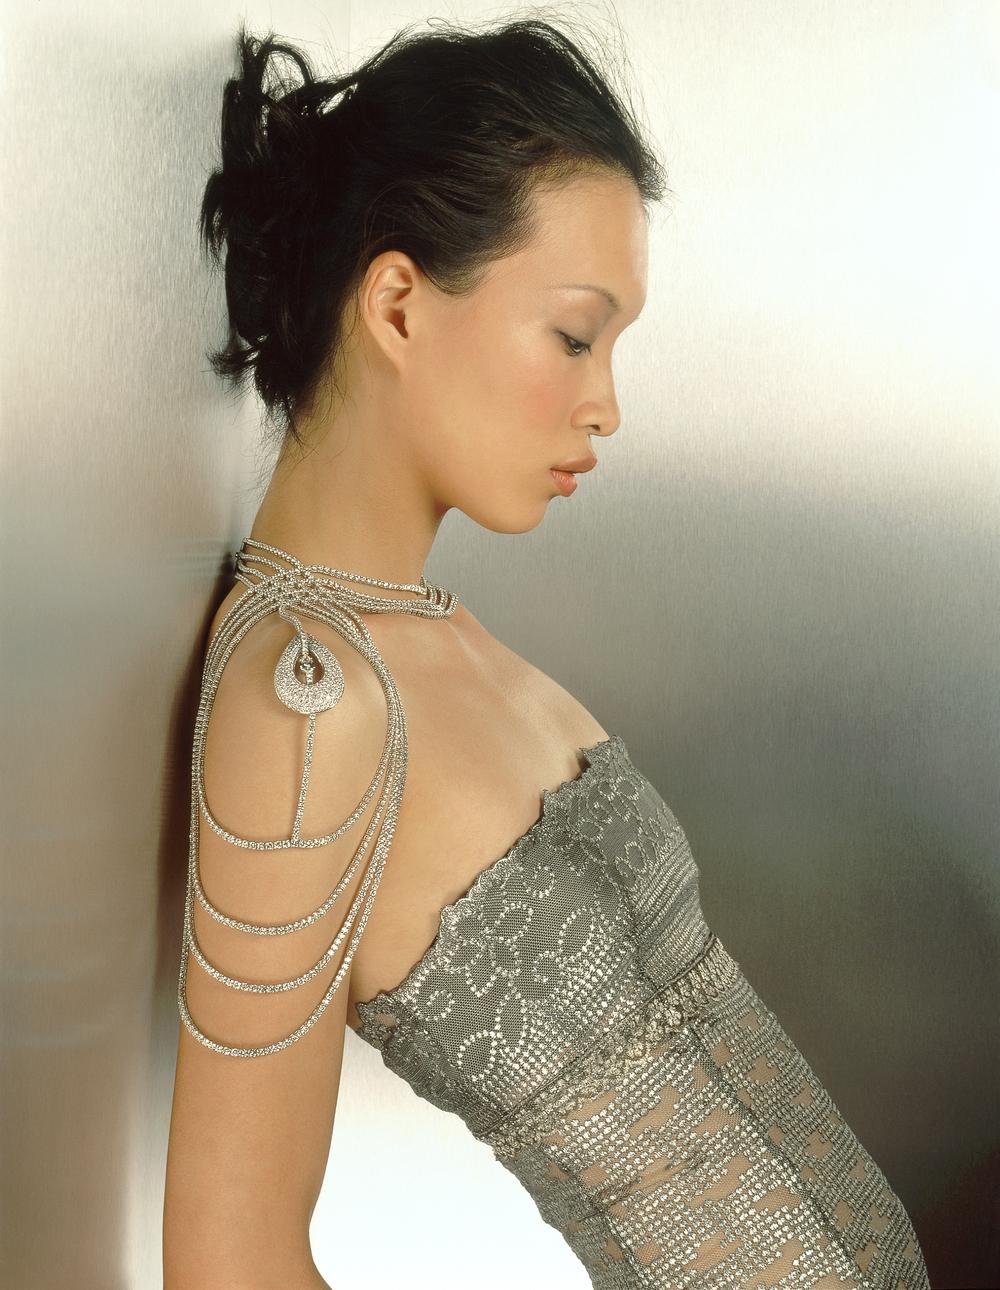 Reena Ahluwalia_Sensuous_De Beers Diamonds-International Awards 2000_photo Albert Watson.jpg